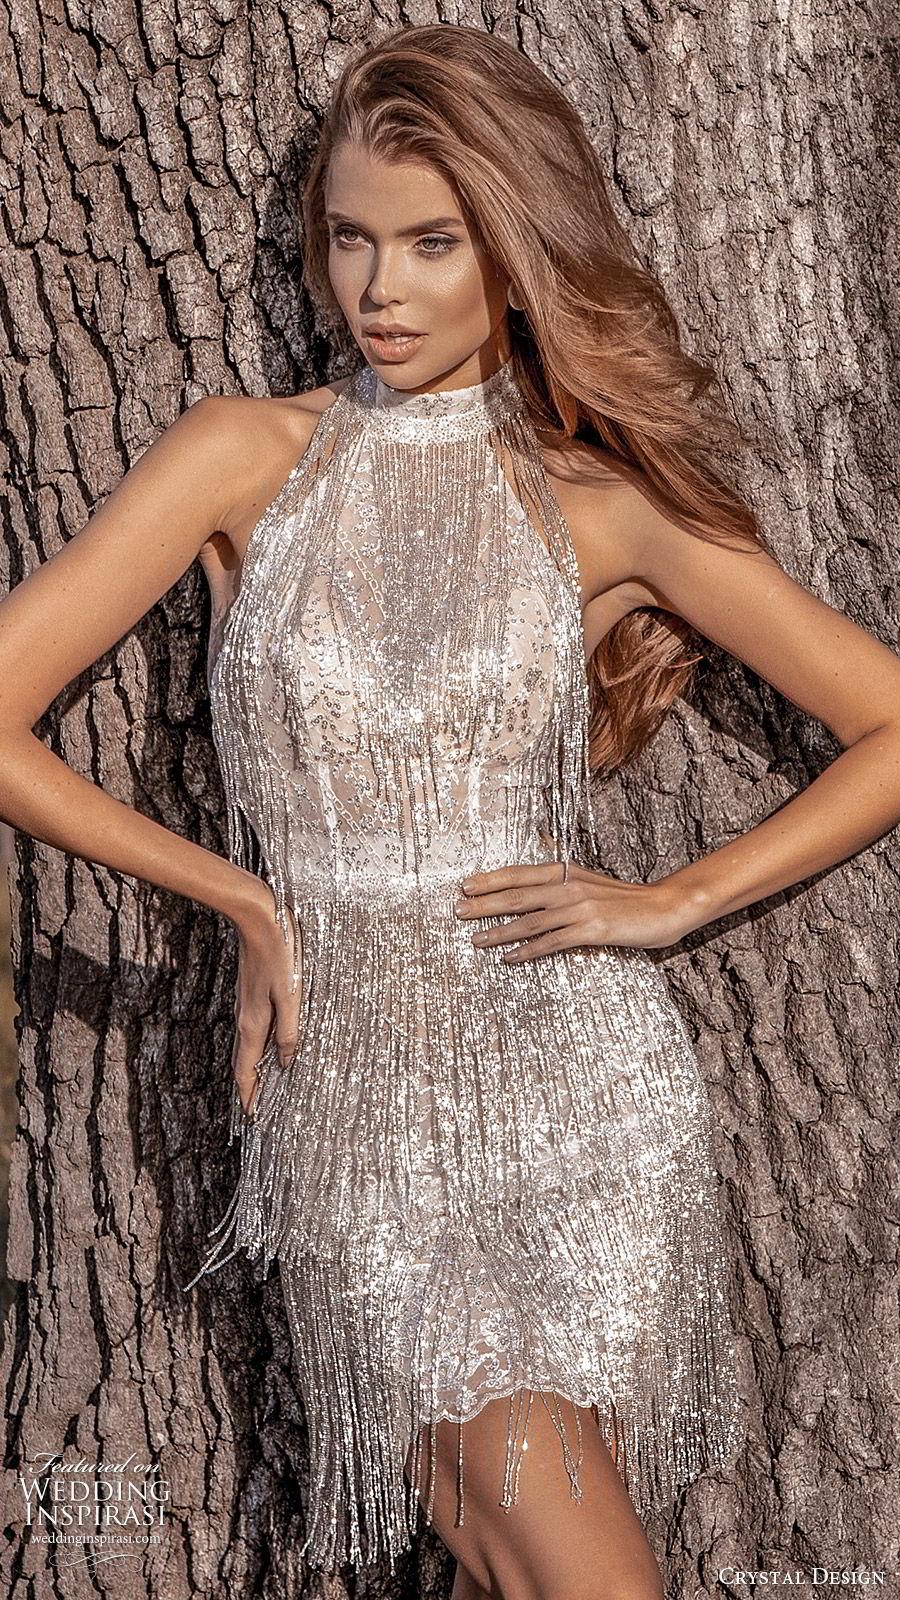 crystal design 2020 couture bridal sleeveless halter neckline short mini wedding dress (10) beaded fringe glitzy glam mv